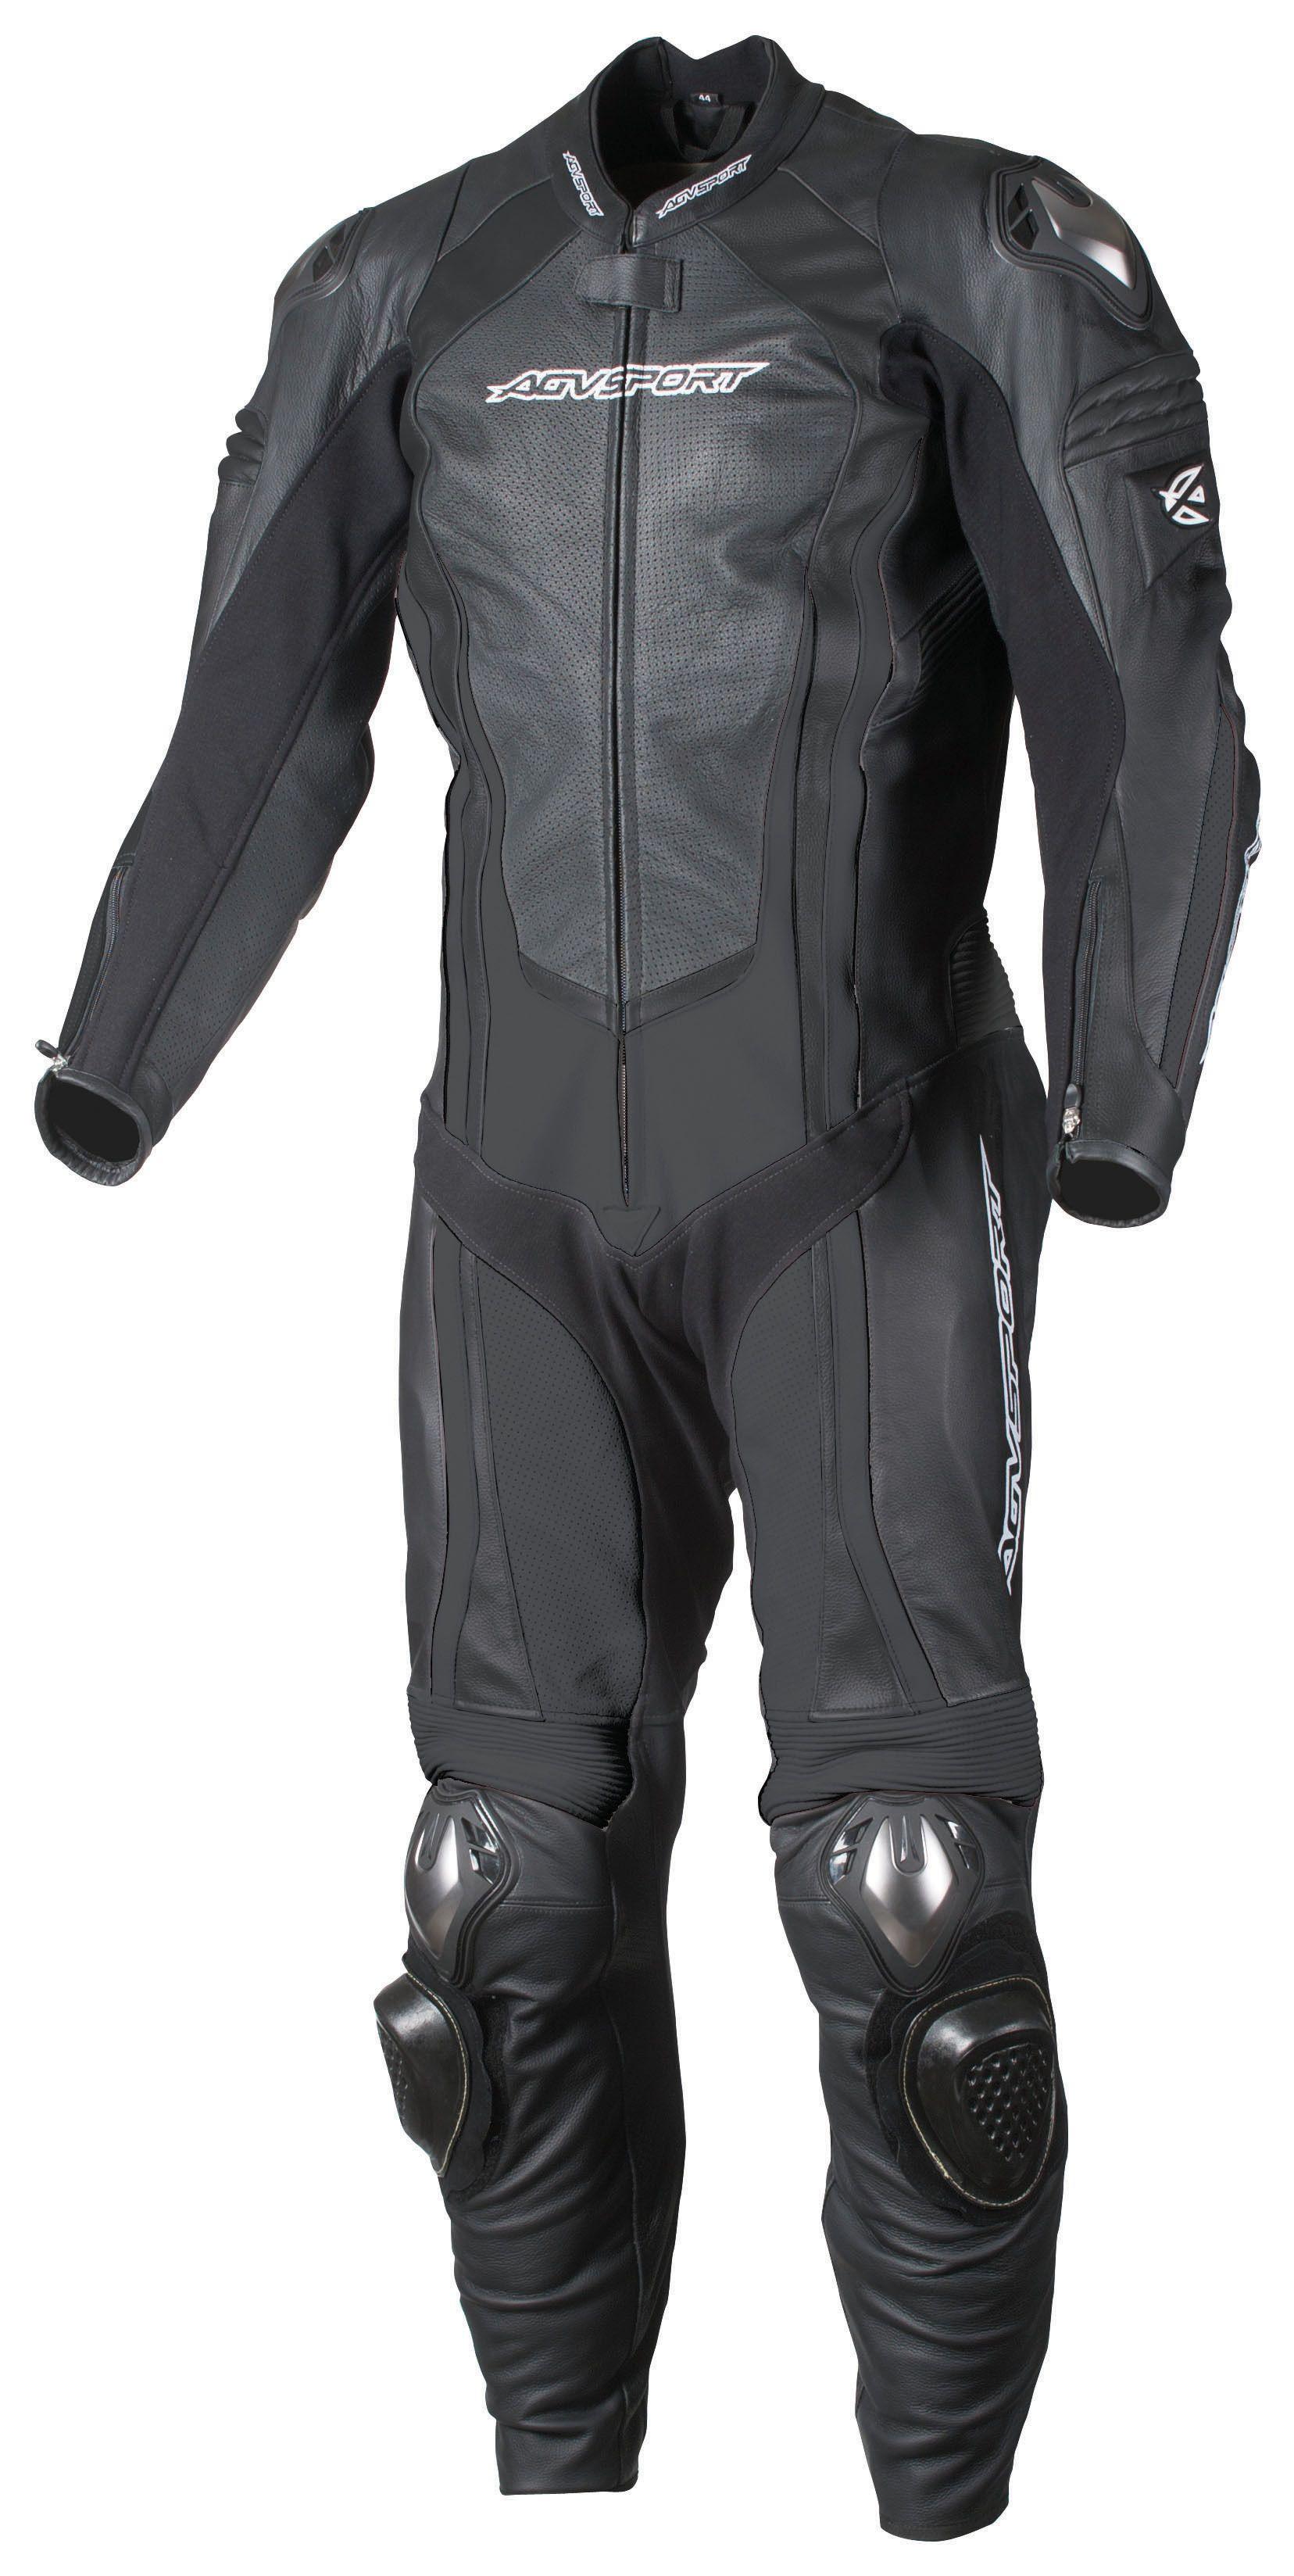 agv_sport_phantom1_piece_leather_suit.jp